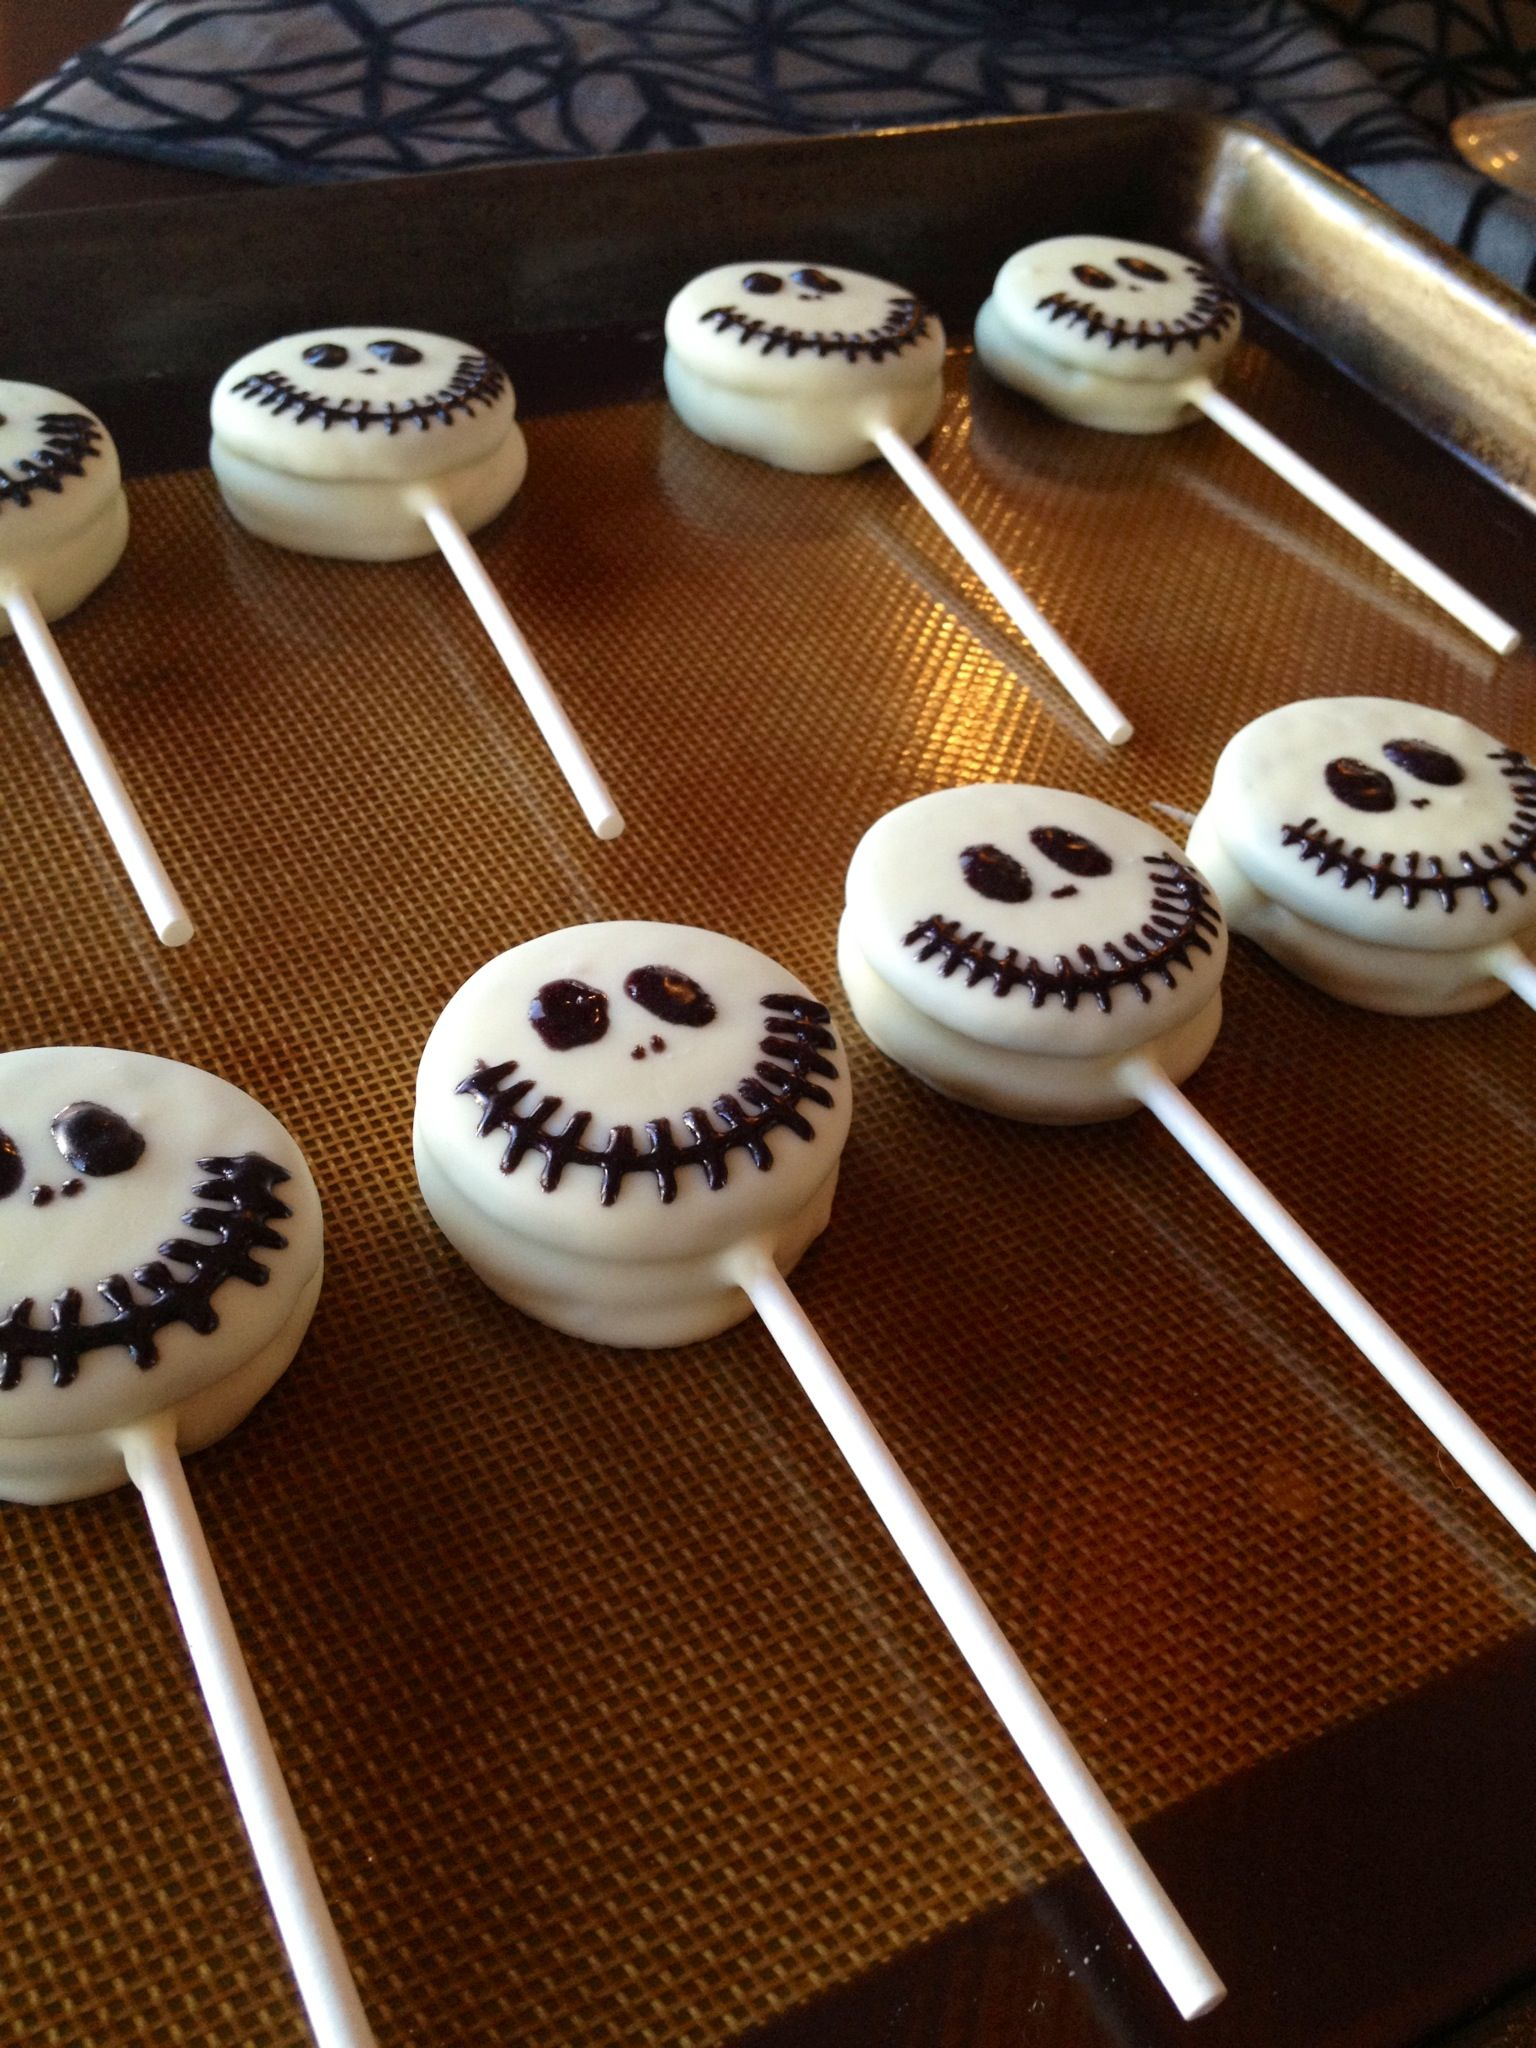 Jack Skellington Oreo Cake Pops